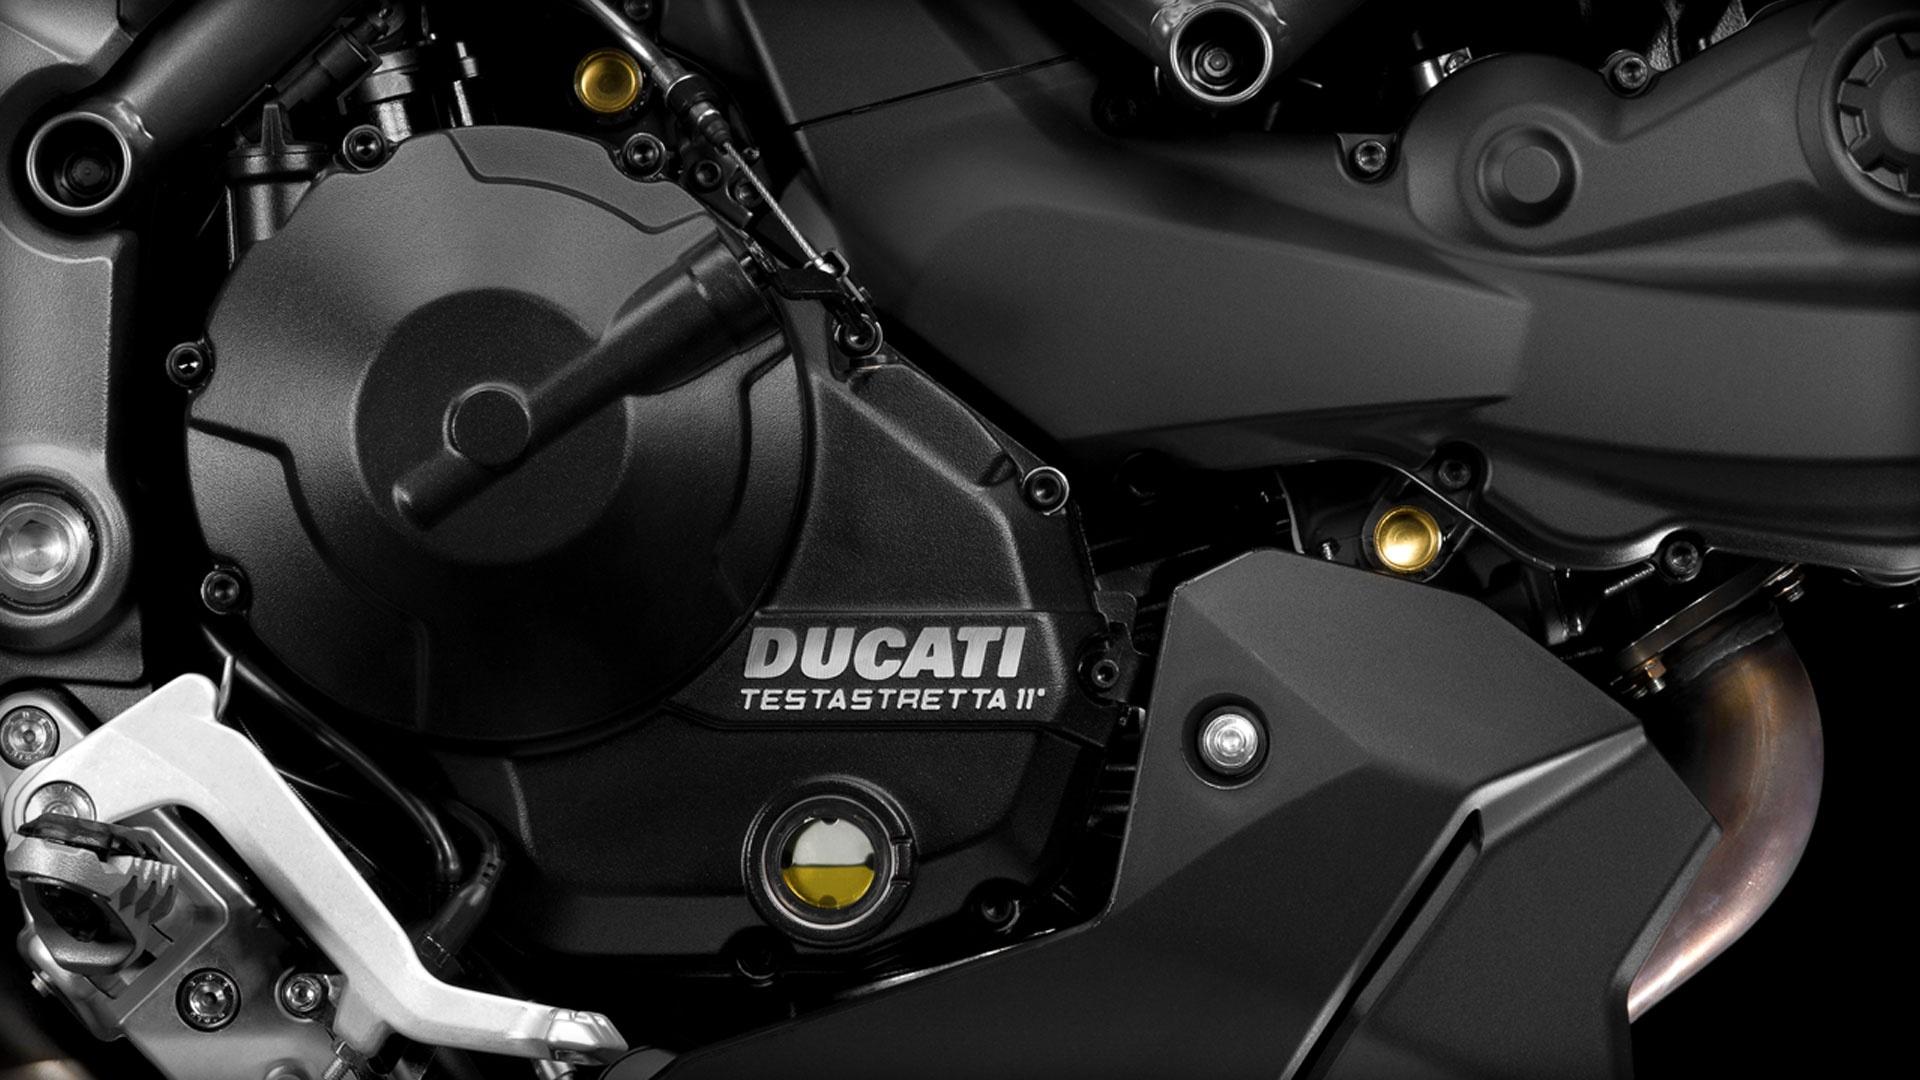 МОТОЦИКЛ DUCATI MULTISTRADA 950 ― Артмото - купить квадроцикл в украине и харькове, мотоцикл, снегоход, скутер, мопед, электромобиль